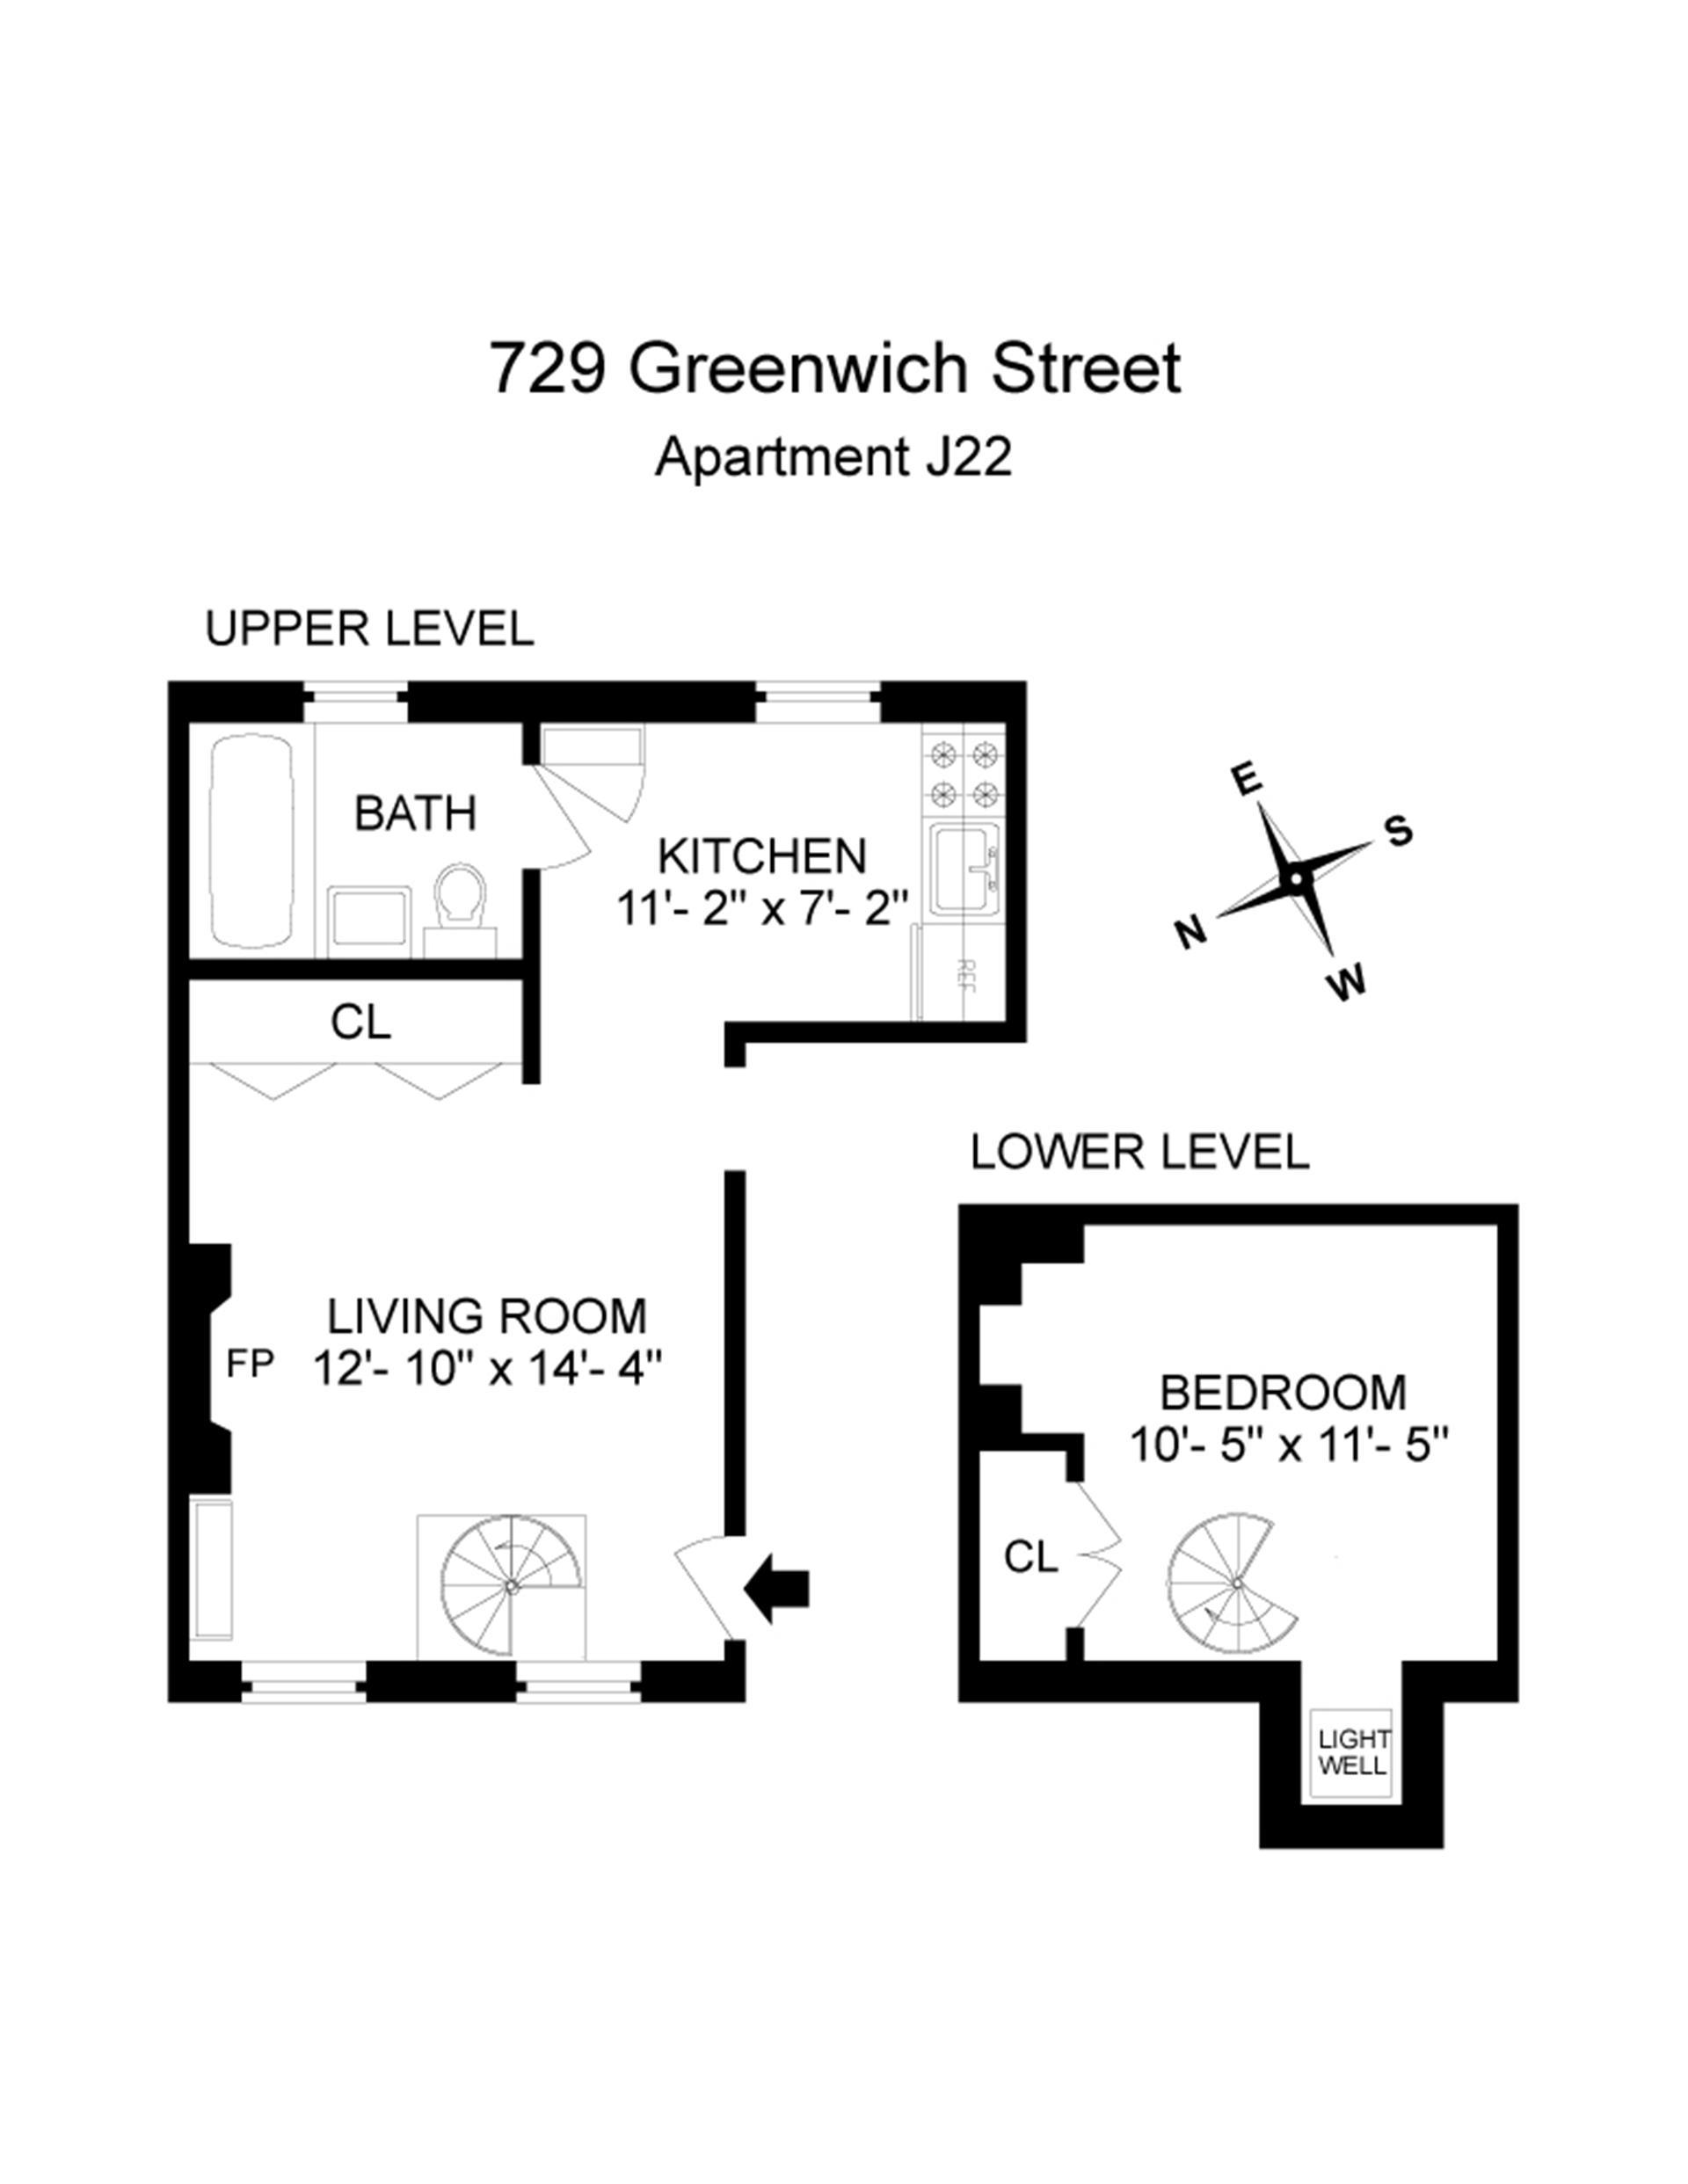 Floor plan of 729 Greenwich Street, J22 - West Village - Meatpacking District, New York